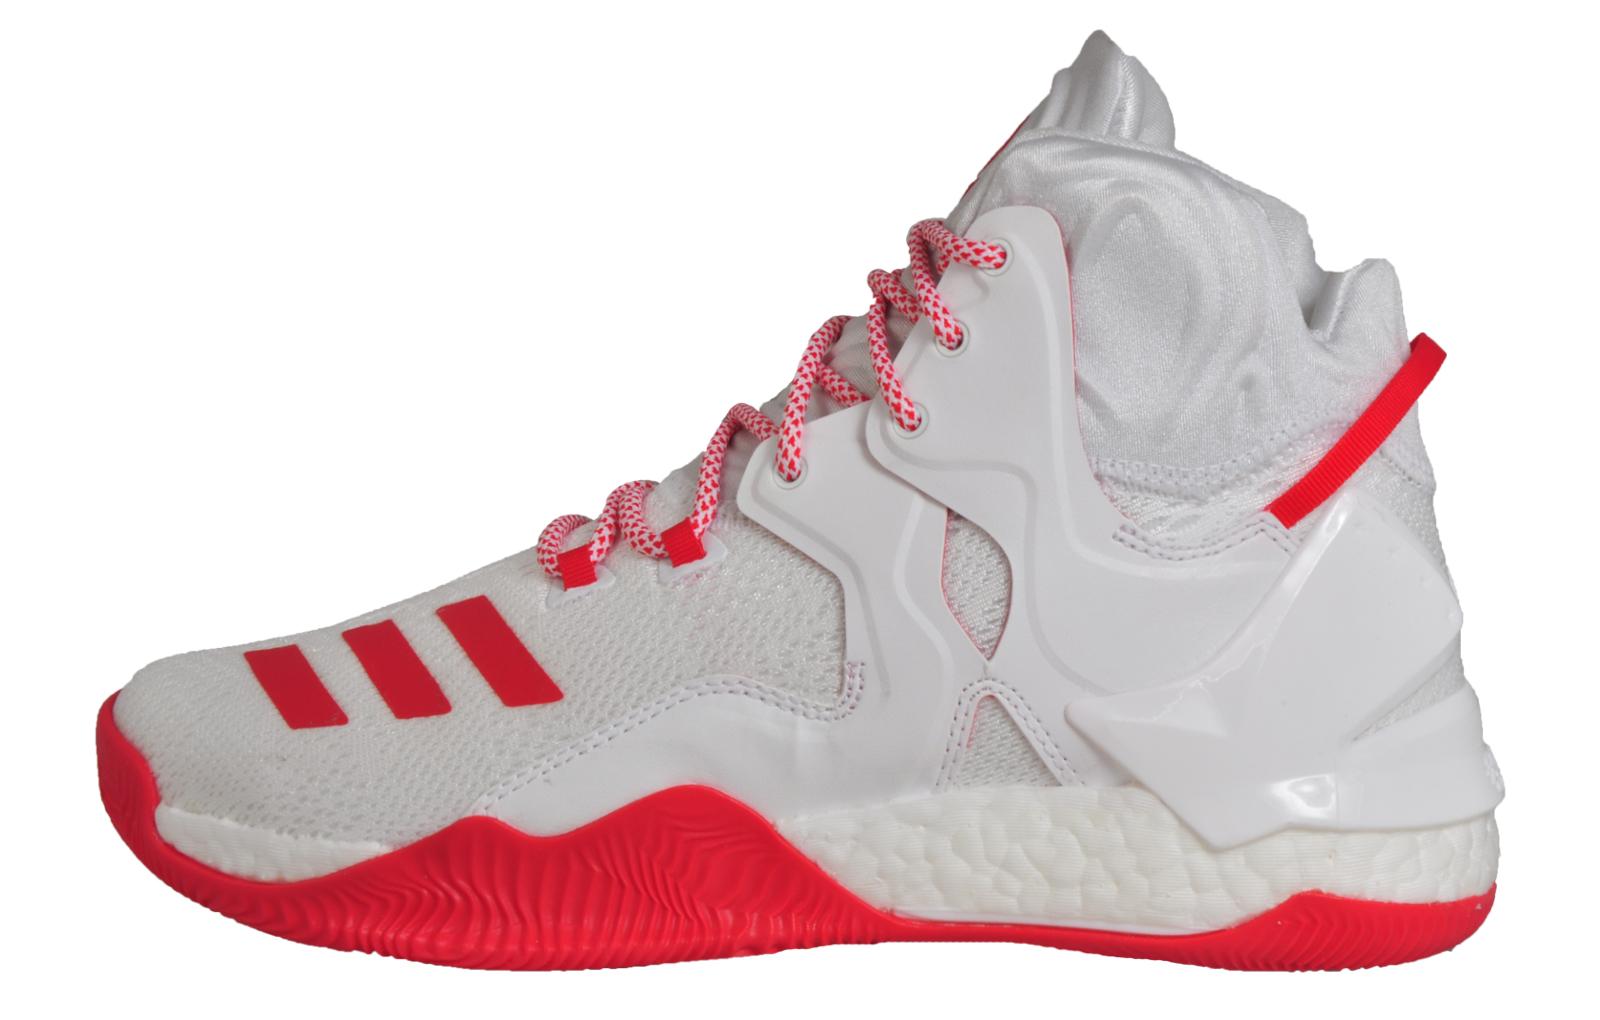 buy popular 2d893 9ee64 Adidas D Rose 7 Mens - AD165381